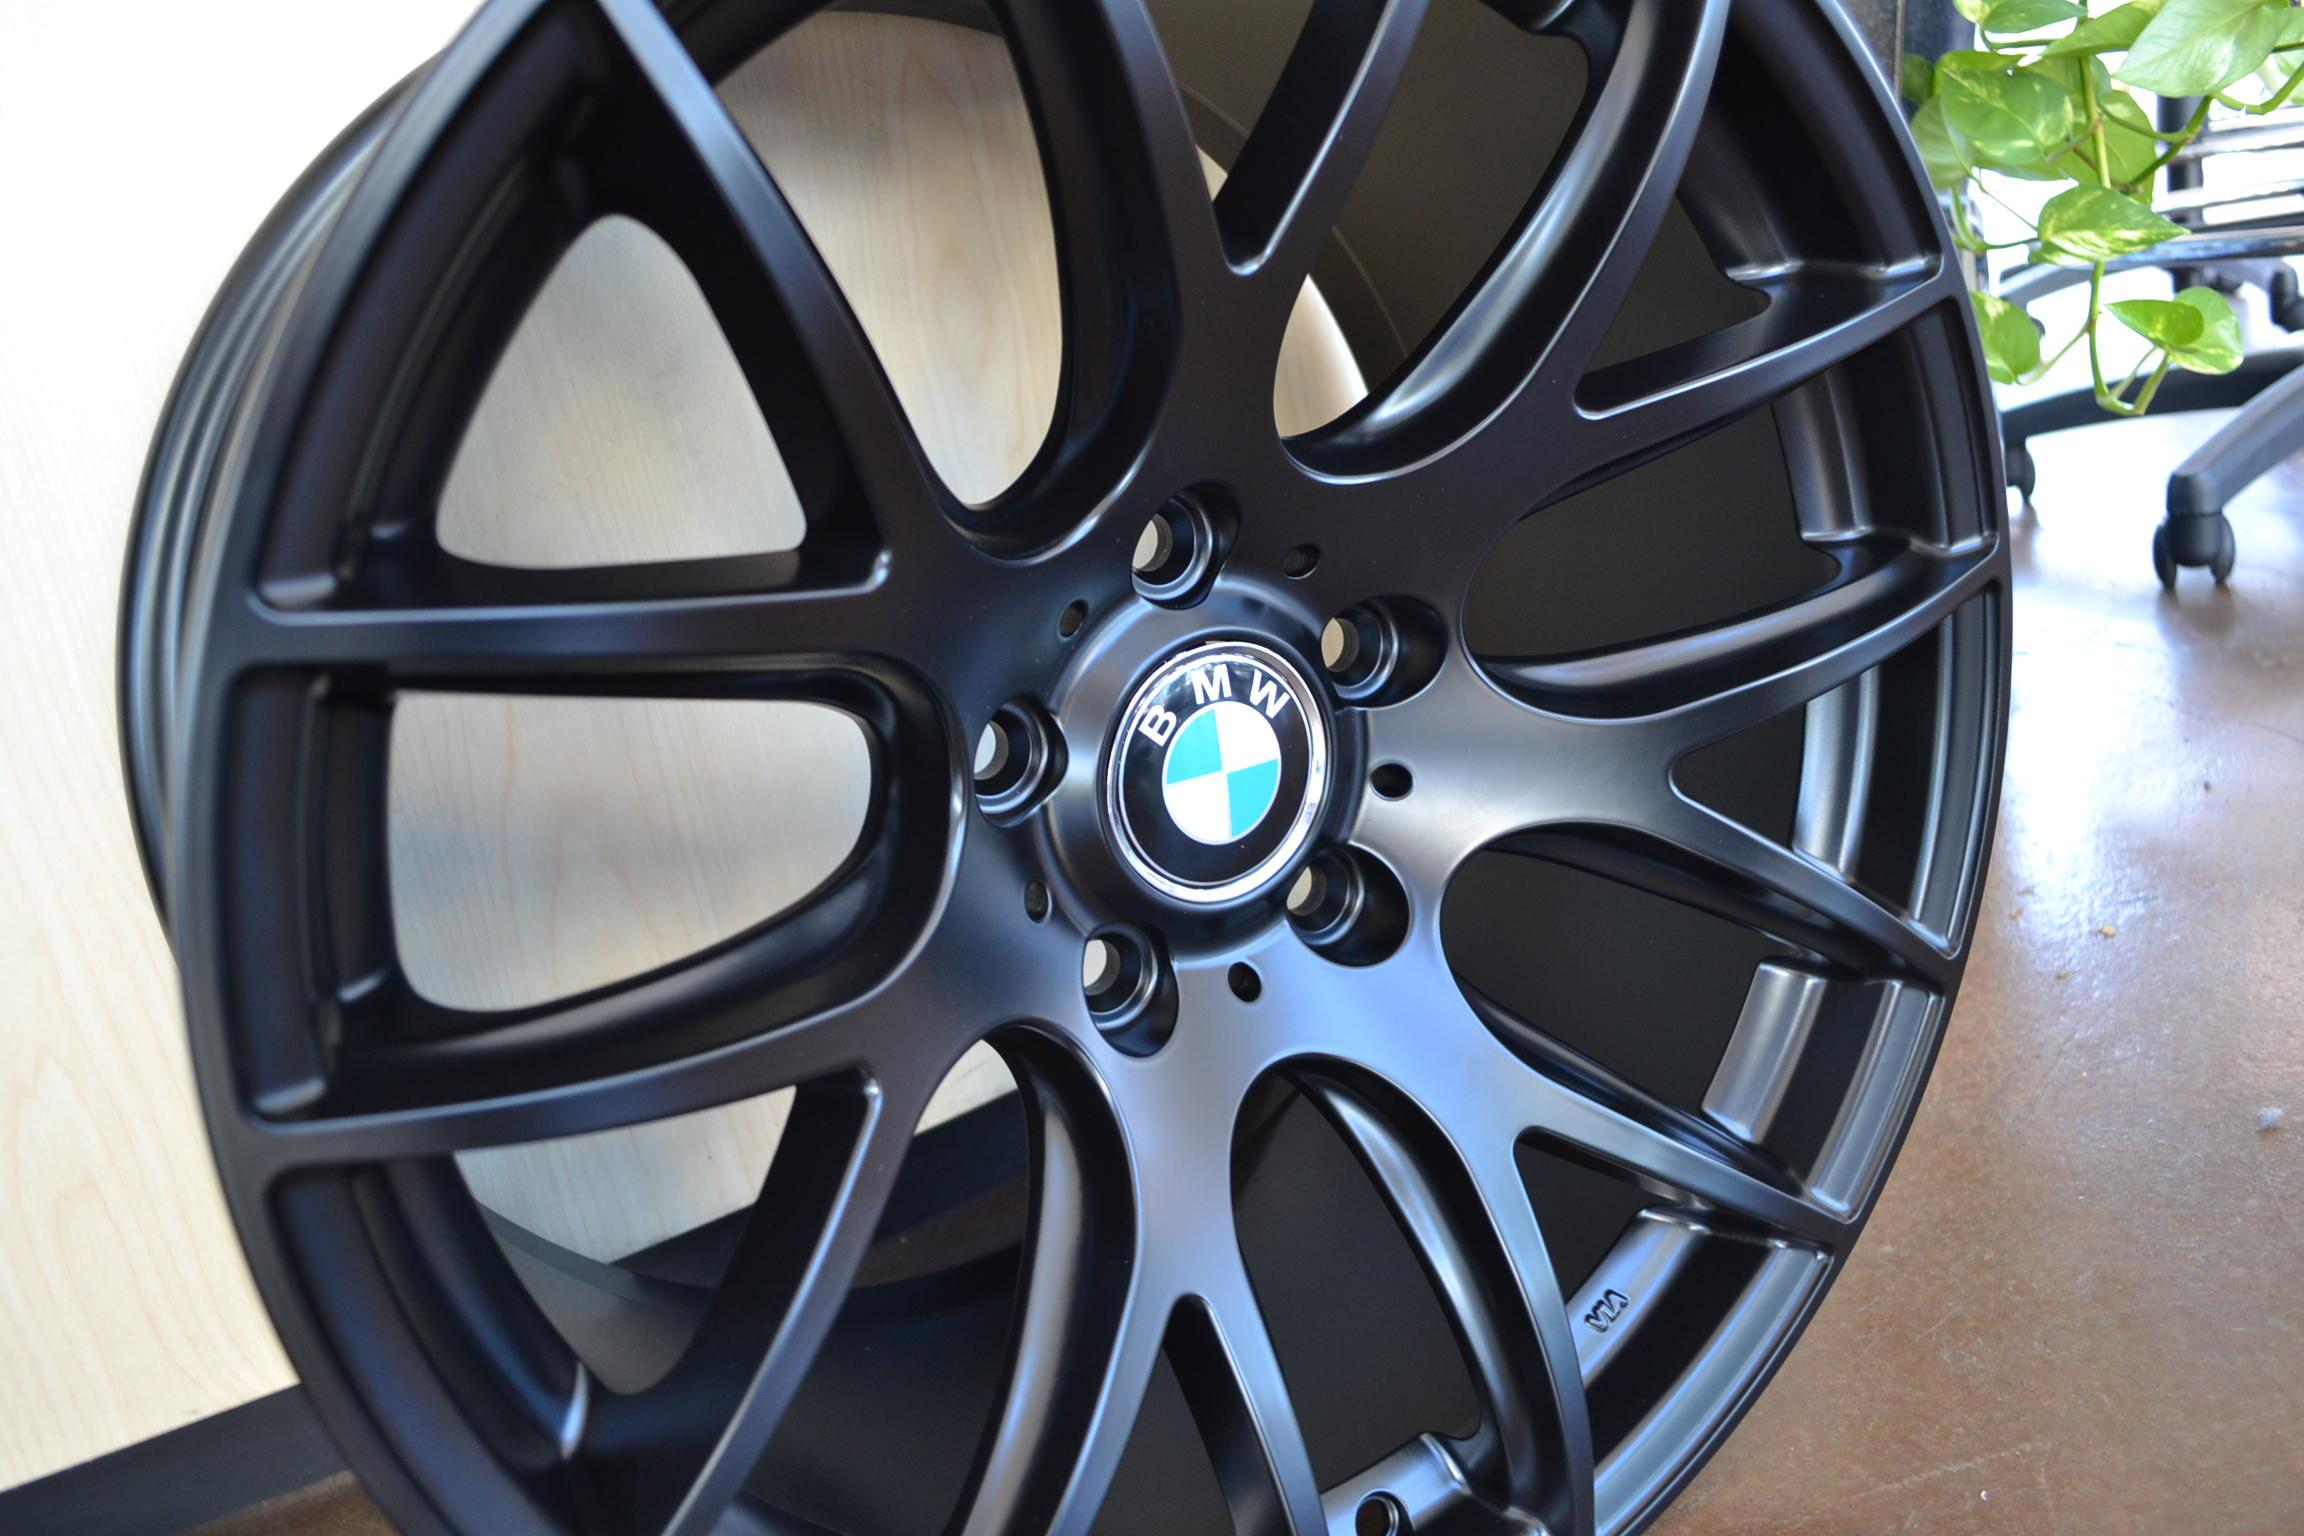 bmw wheels rim 325i 325xi 325ci e46 e90 m3 matte black 18. Black Bedroom Furniture Sets. Home Design Ideas